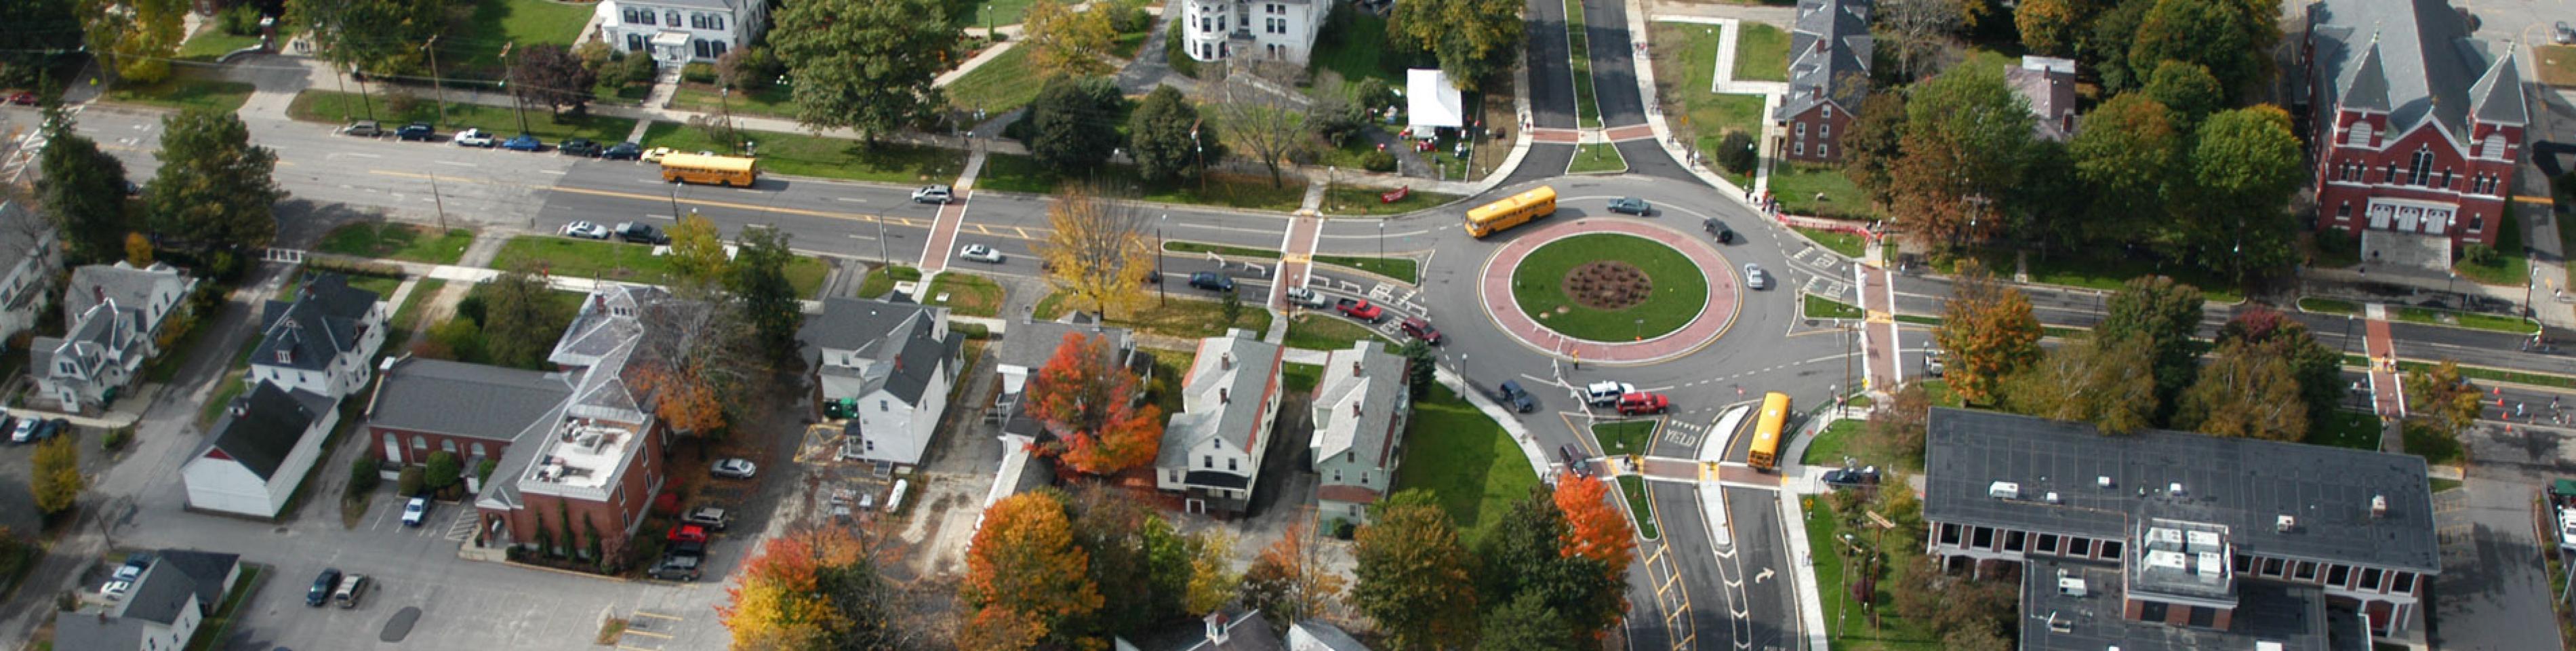 Keene Roundabout